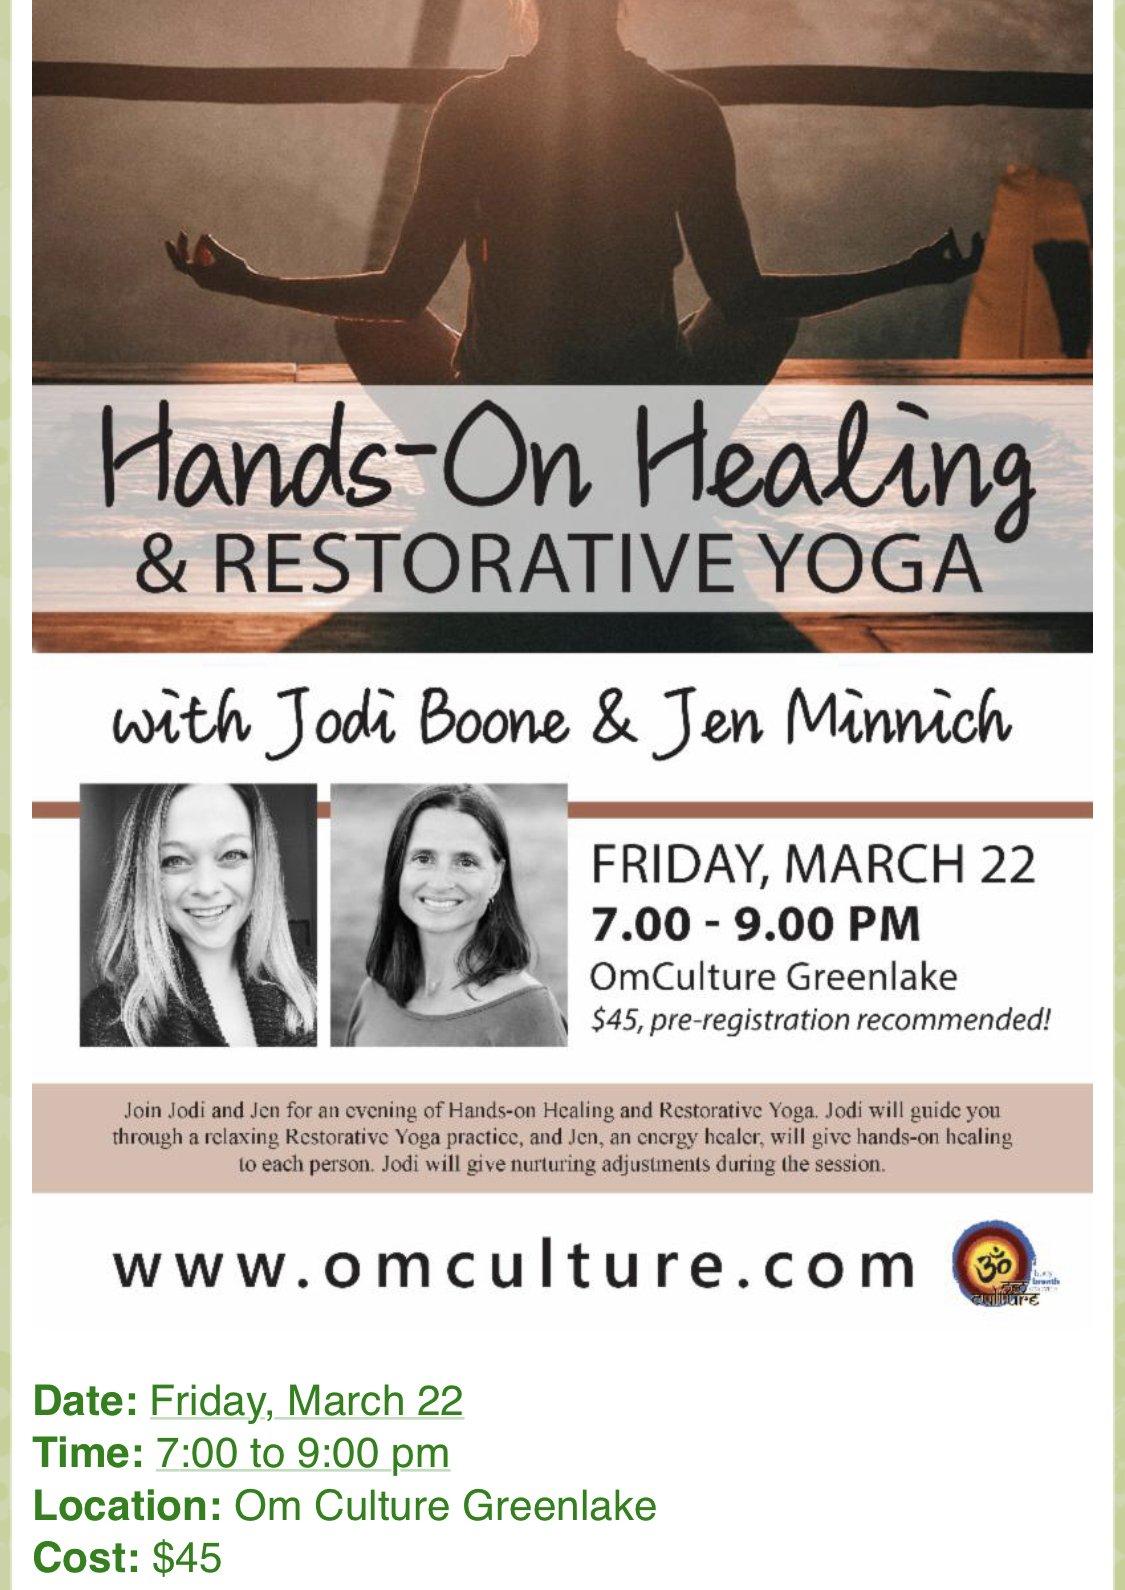 Hands-On Healing & Restorative Yoga with Jodi Boone & Jenn Minnich